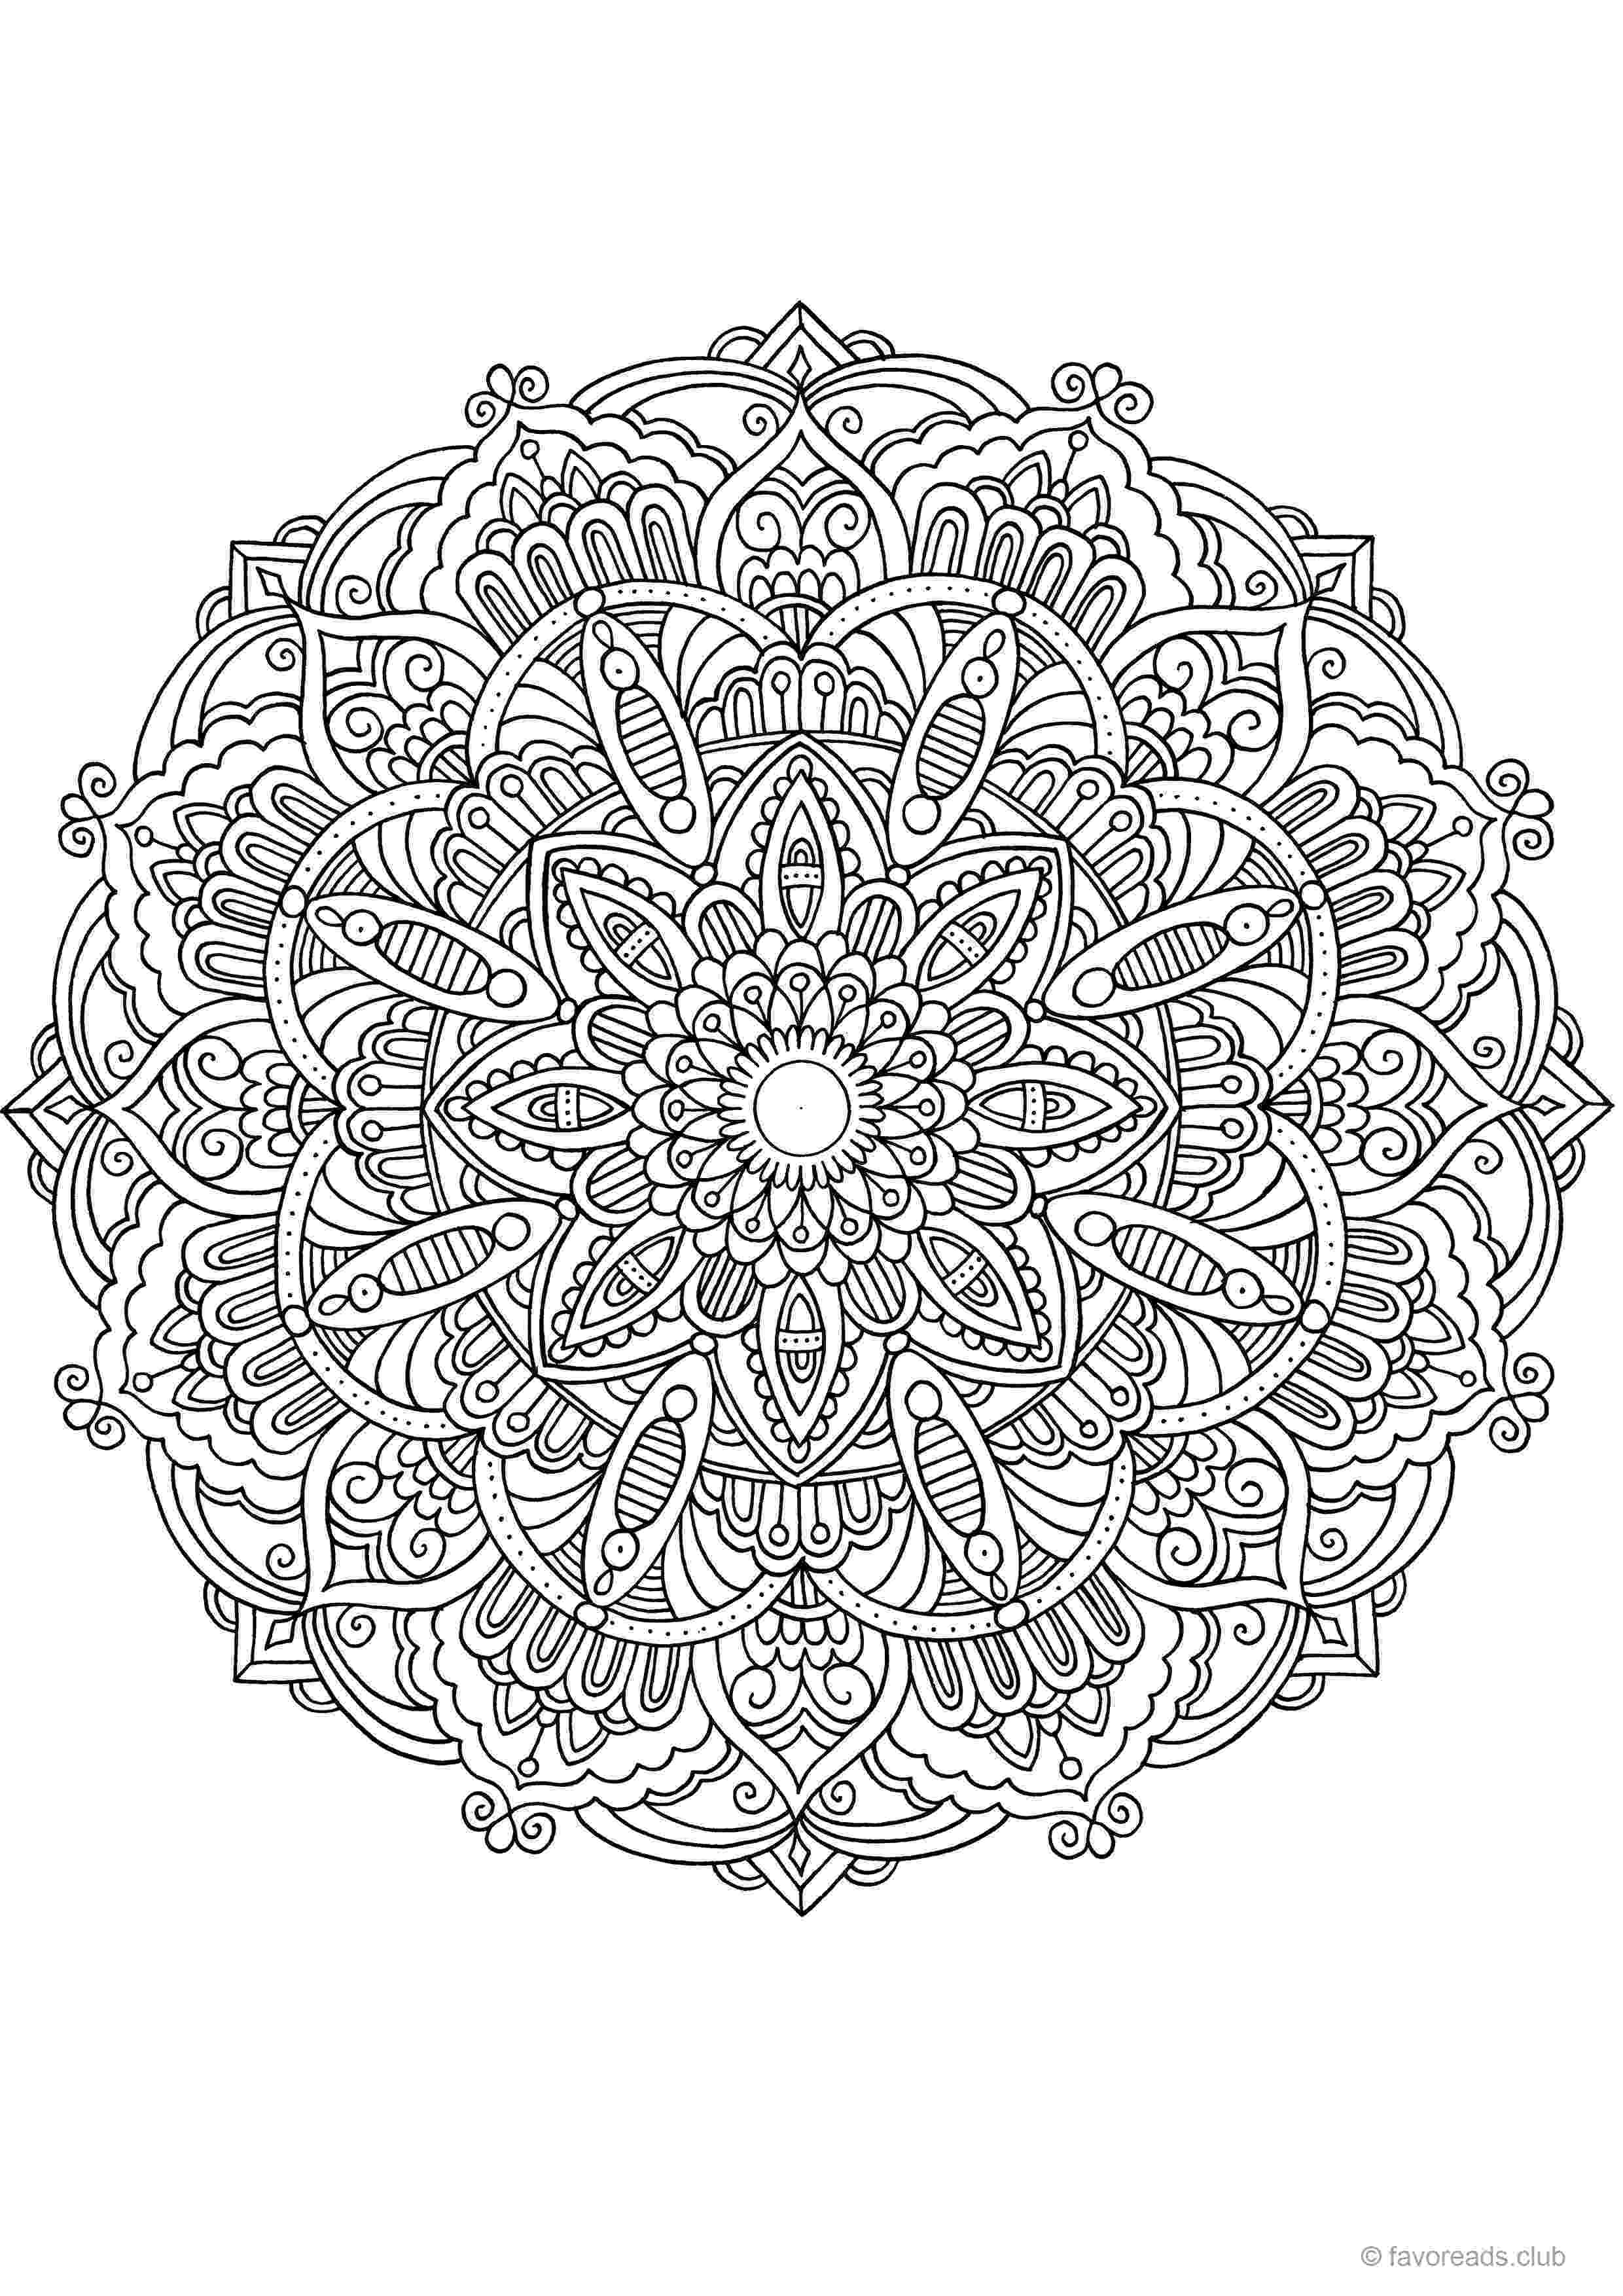 free printable mandala designs printable mandala coloring pages for kids cool2bkids mandala free printable designs